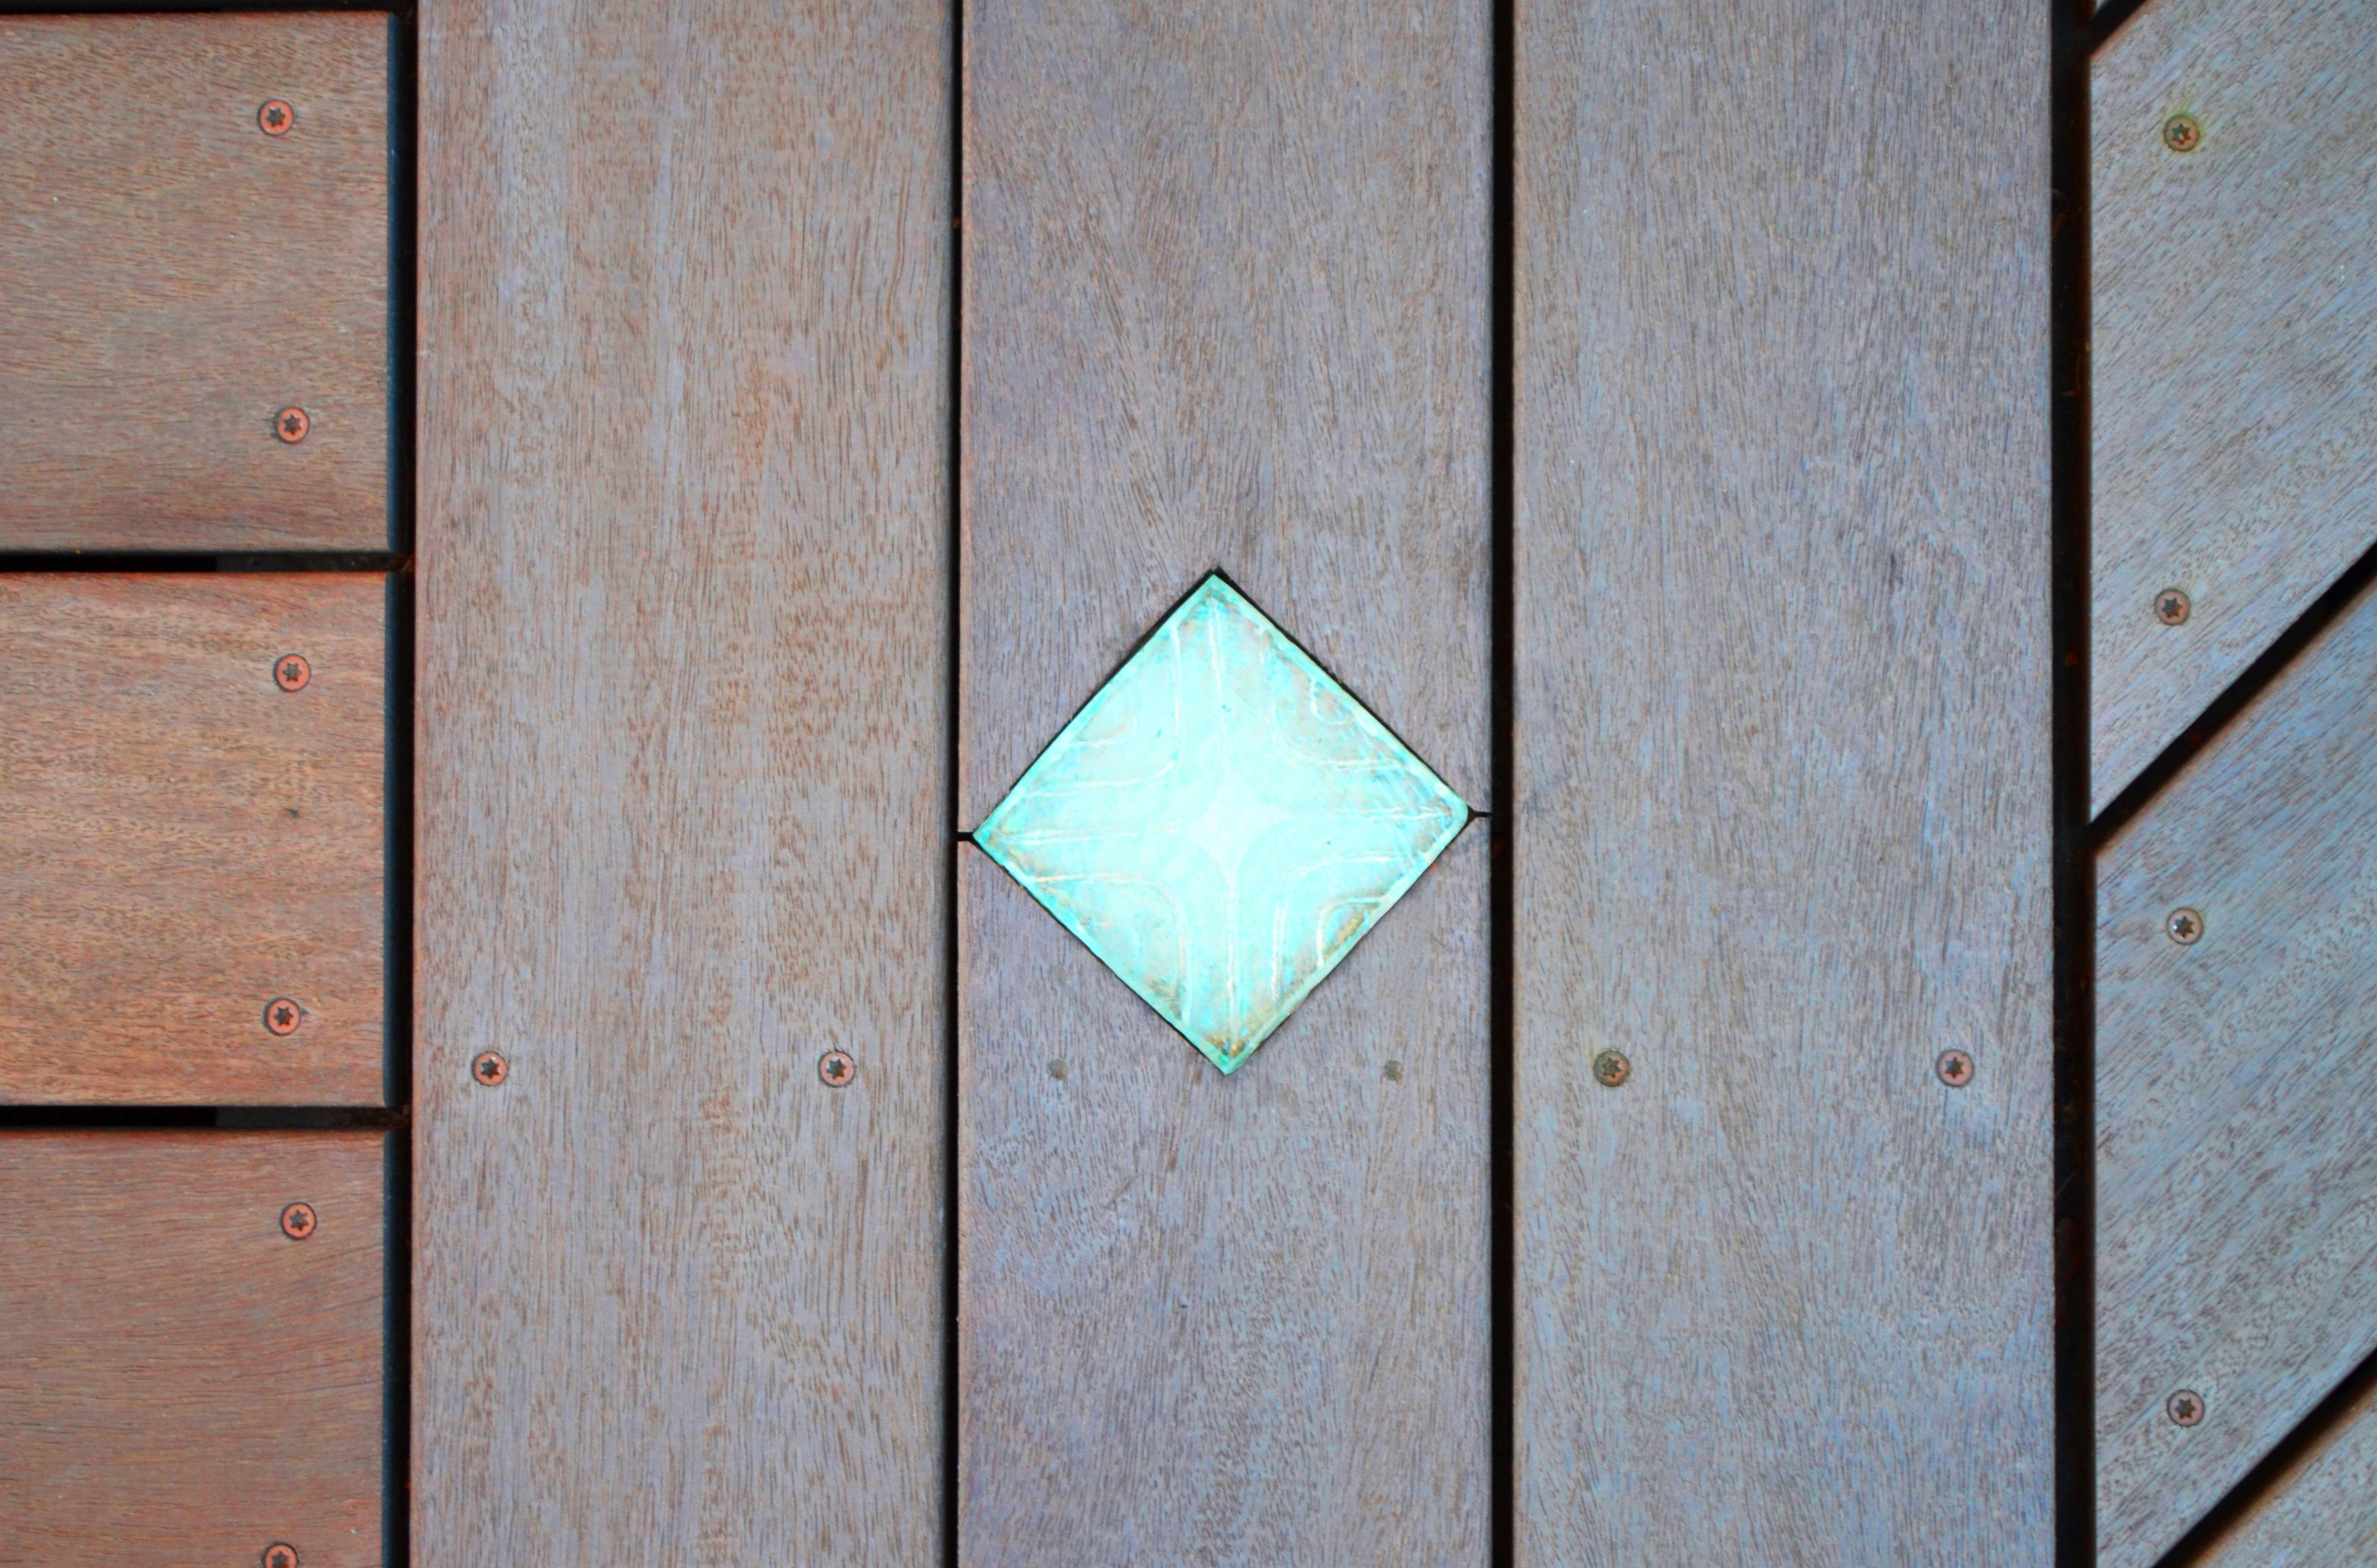 Close-up view of porch light.